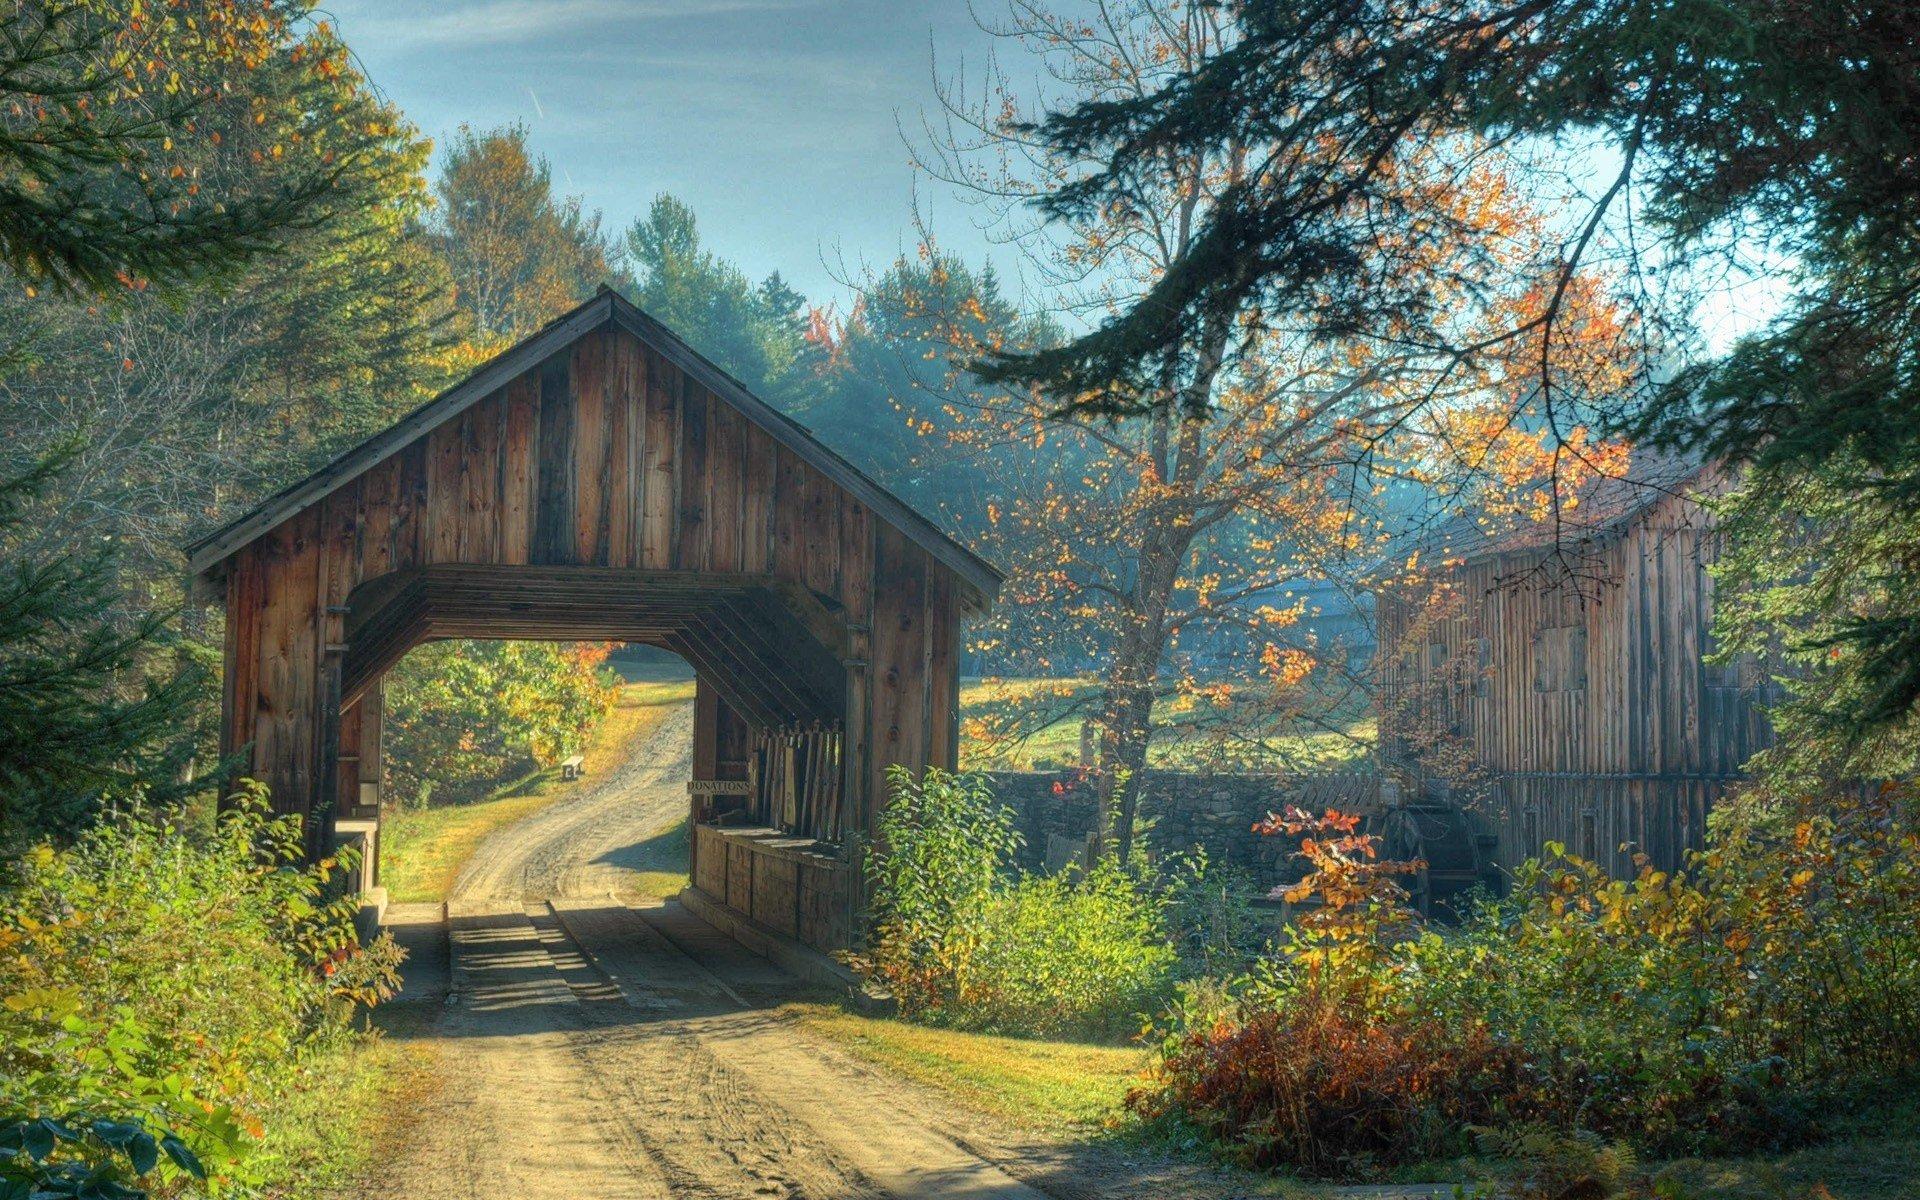 landscape wallpaperwooden bridgecabin - photo #1